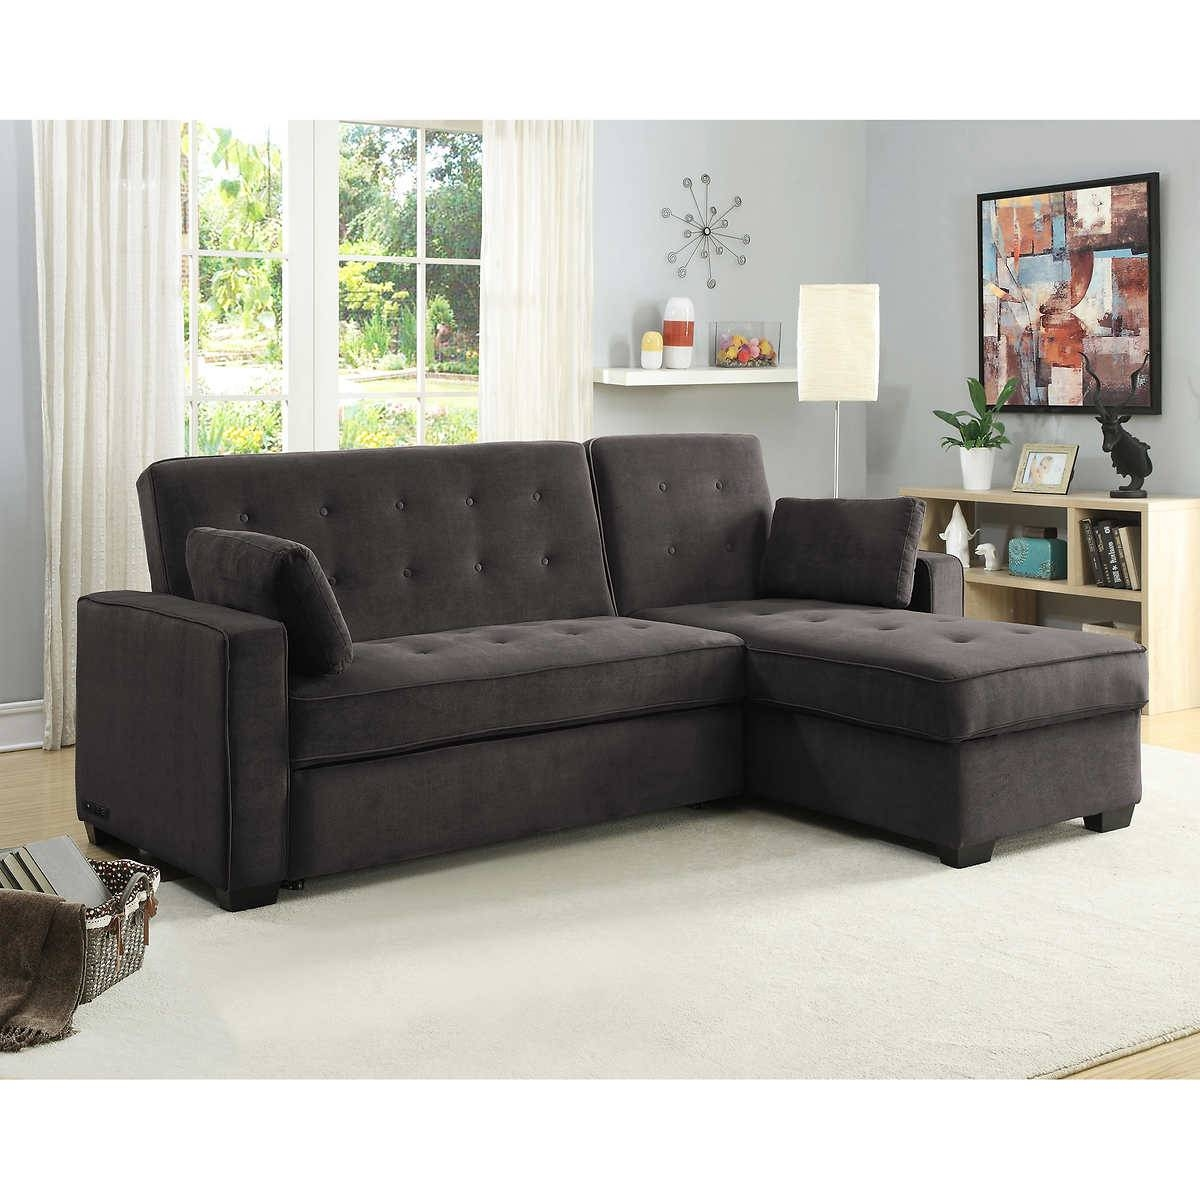 Sofas Center : Cosco Reclining Sofas Sofa Costco 2016Costco within Berkline Sofa (Image 22 of 30)